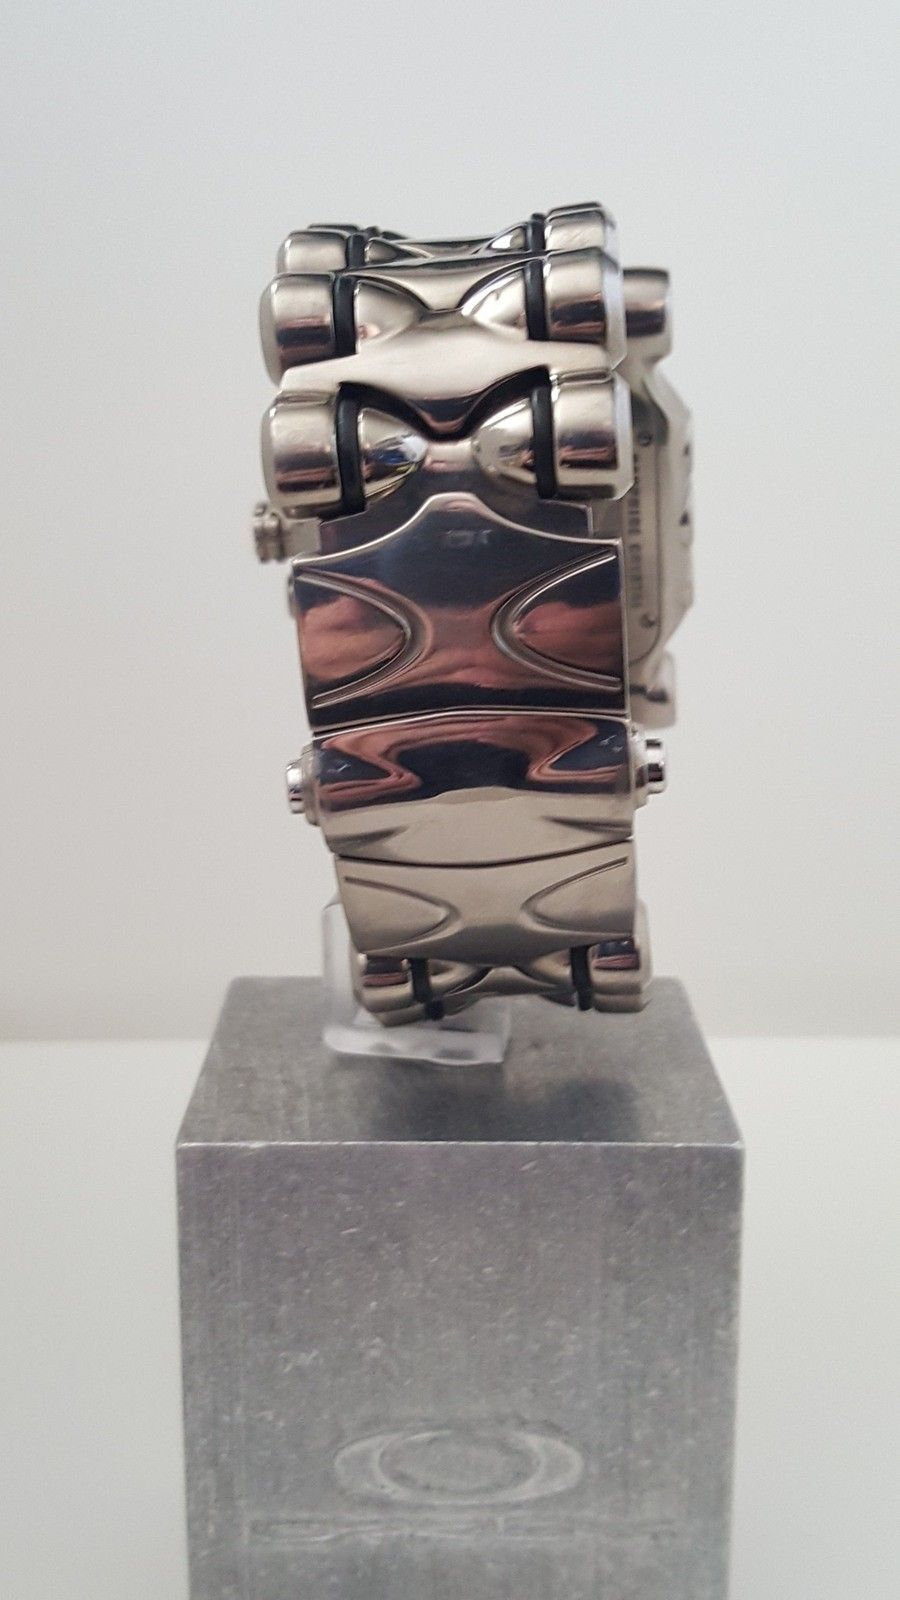 Minute Machine -Custom Polished - Black - Titanium Originally - 20150919_142209.jpg